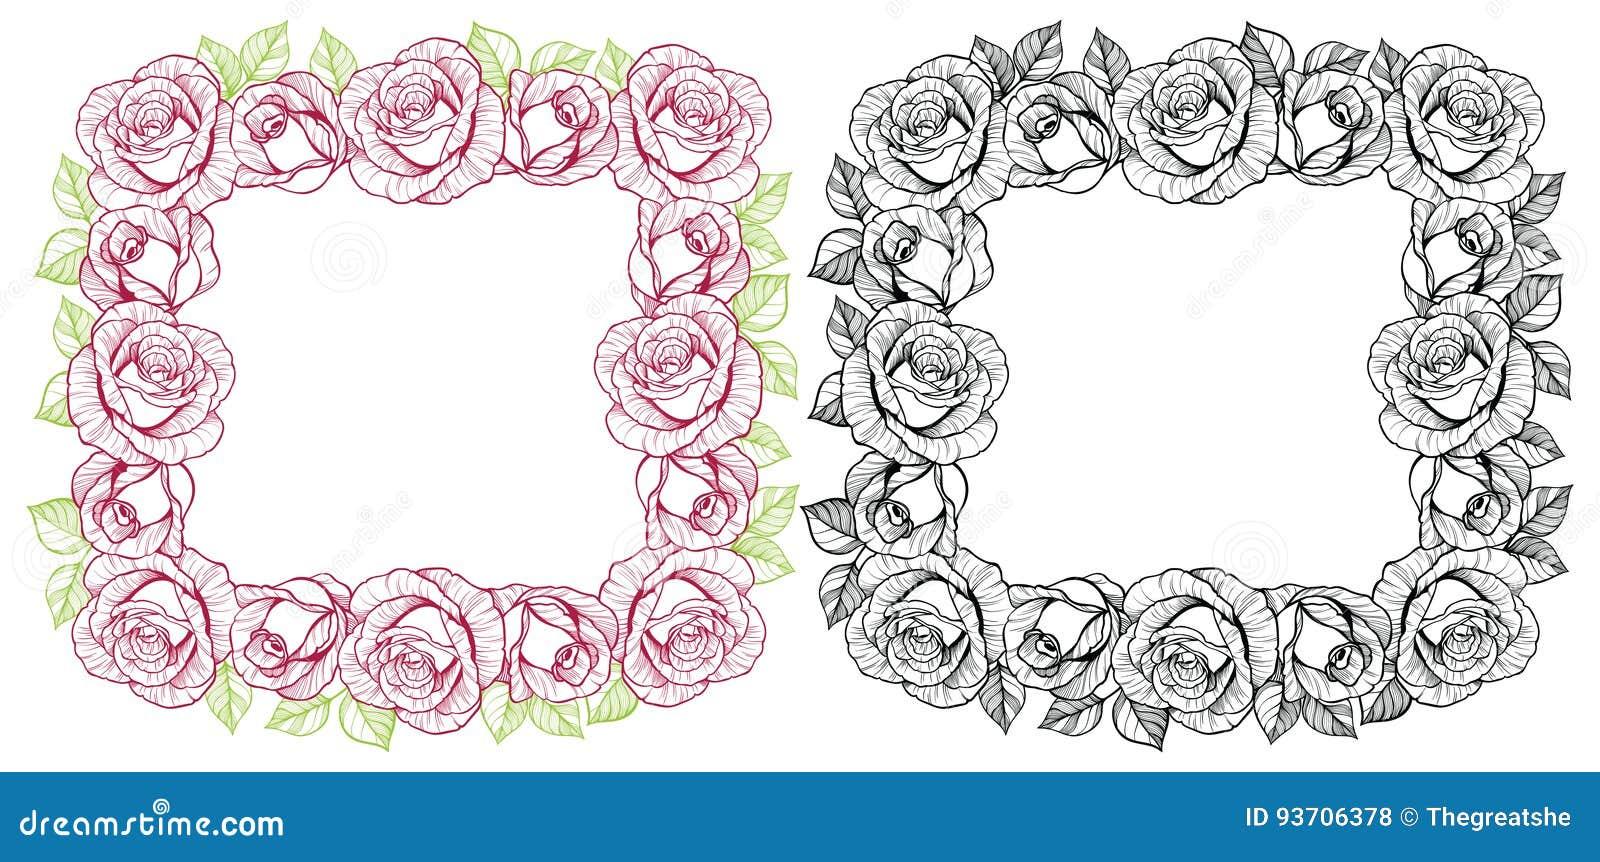 Rose Flower Square Frame Stock Vector Illustration Of Illustrations